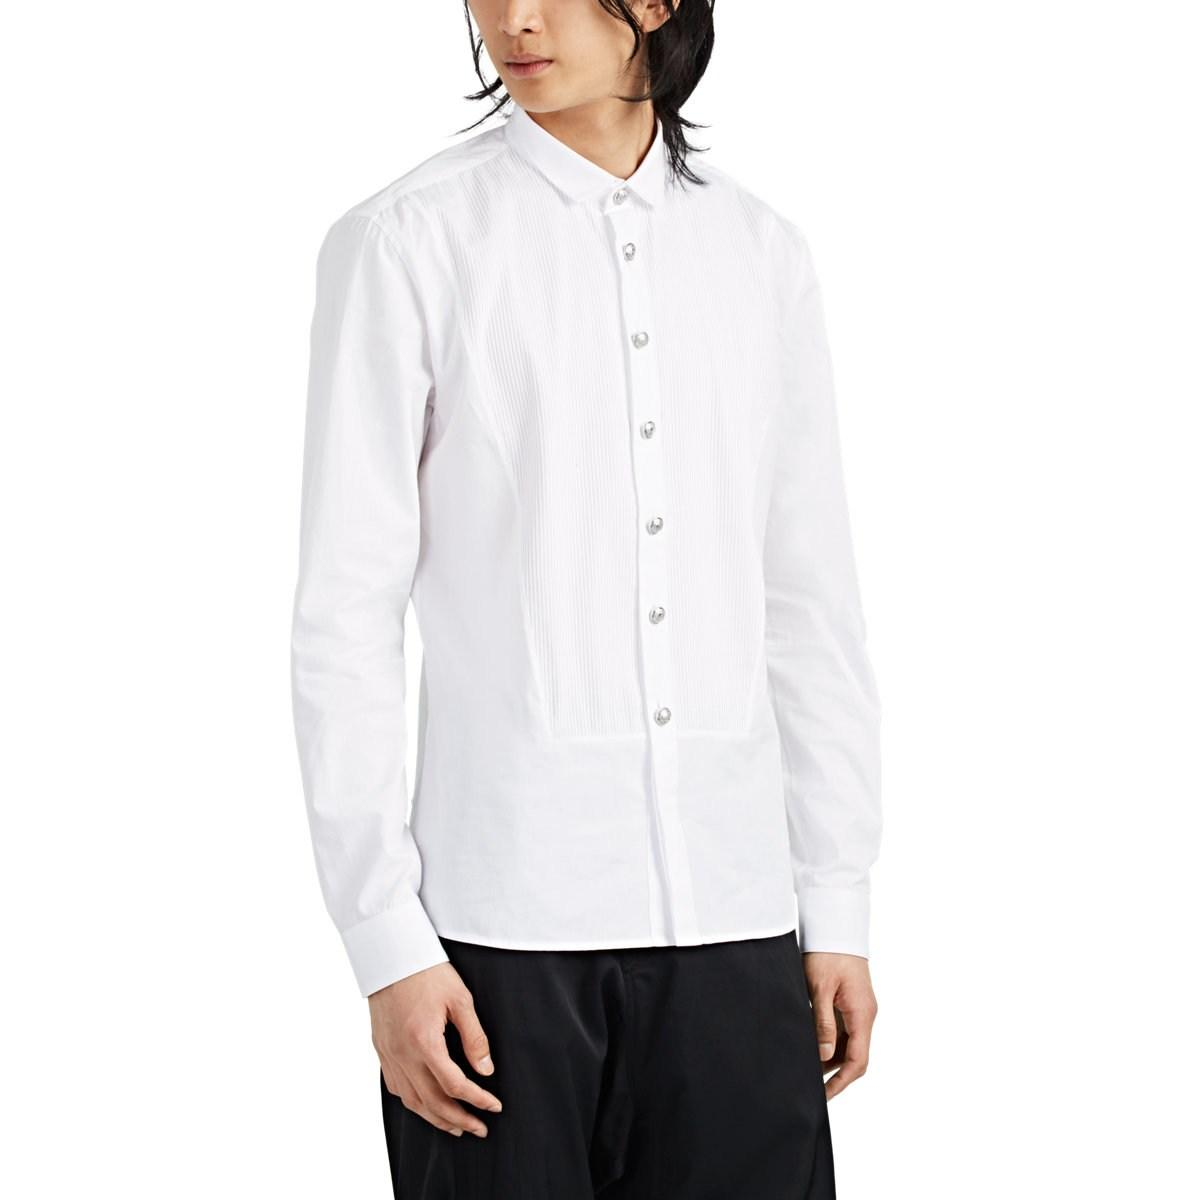 965cfa2a4e5e3a Balmain - White Pleated-bib Cotton Tuxedo Shirt for Men - Lyst. View  fullscreen